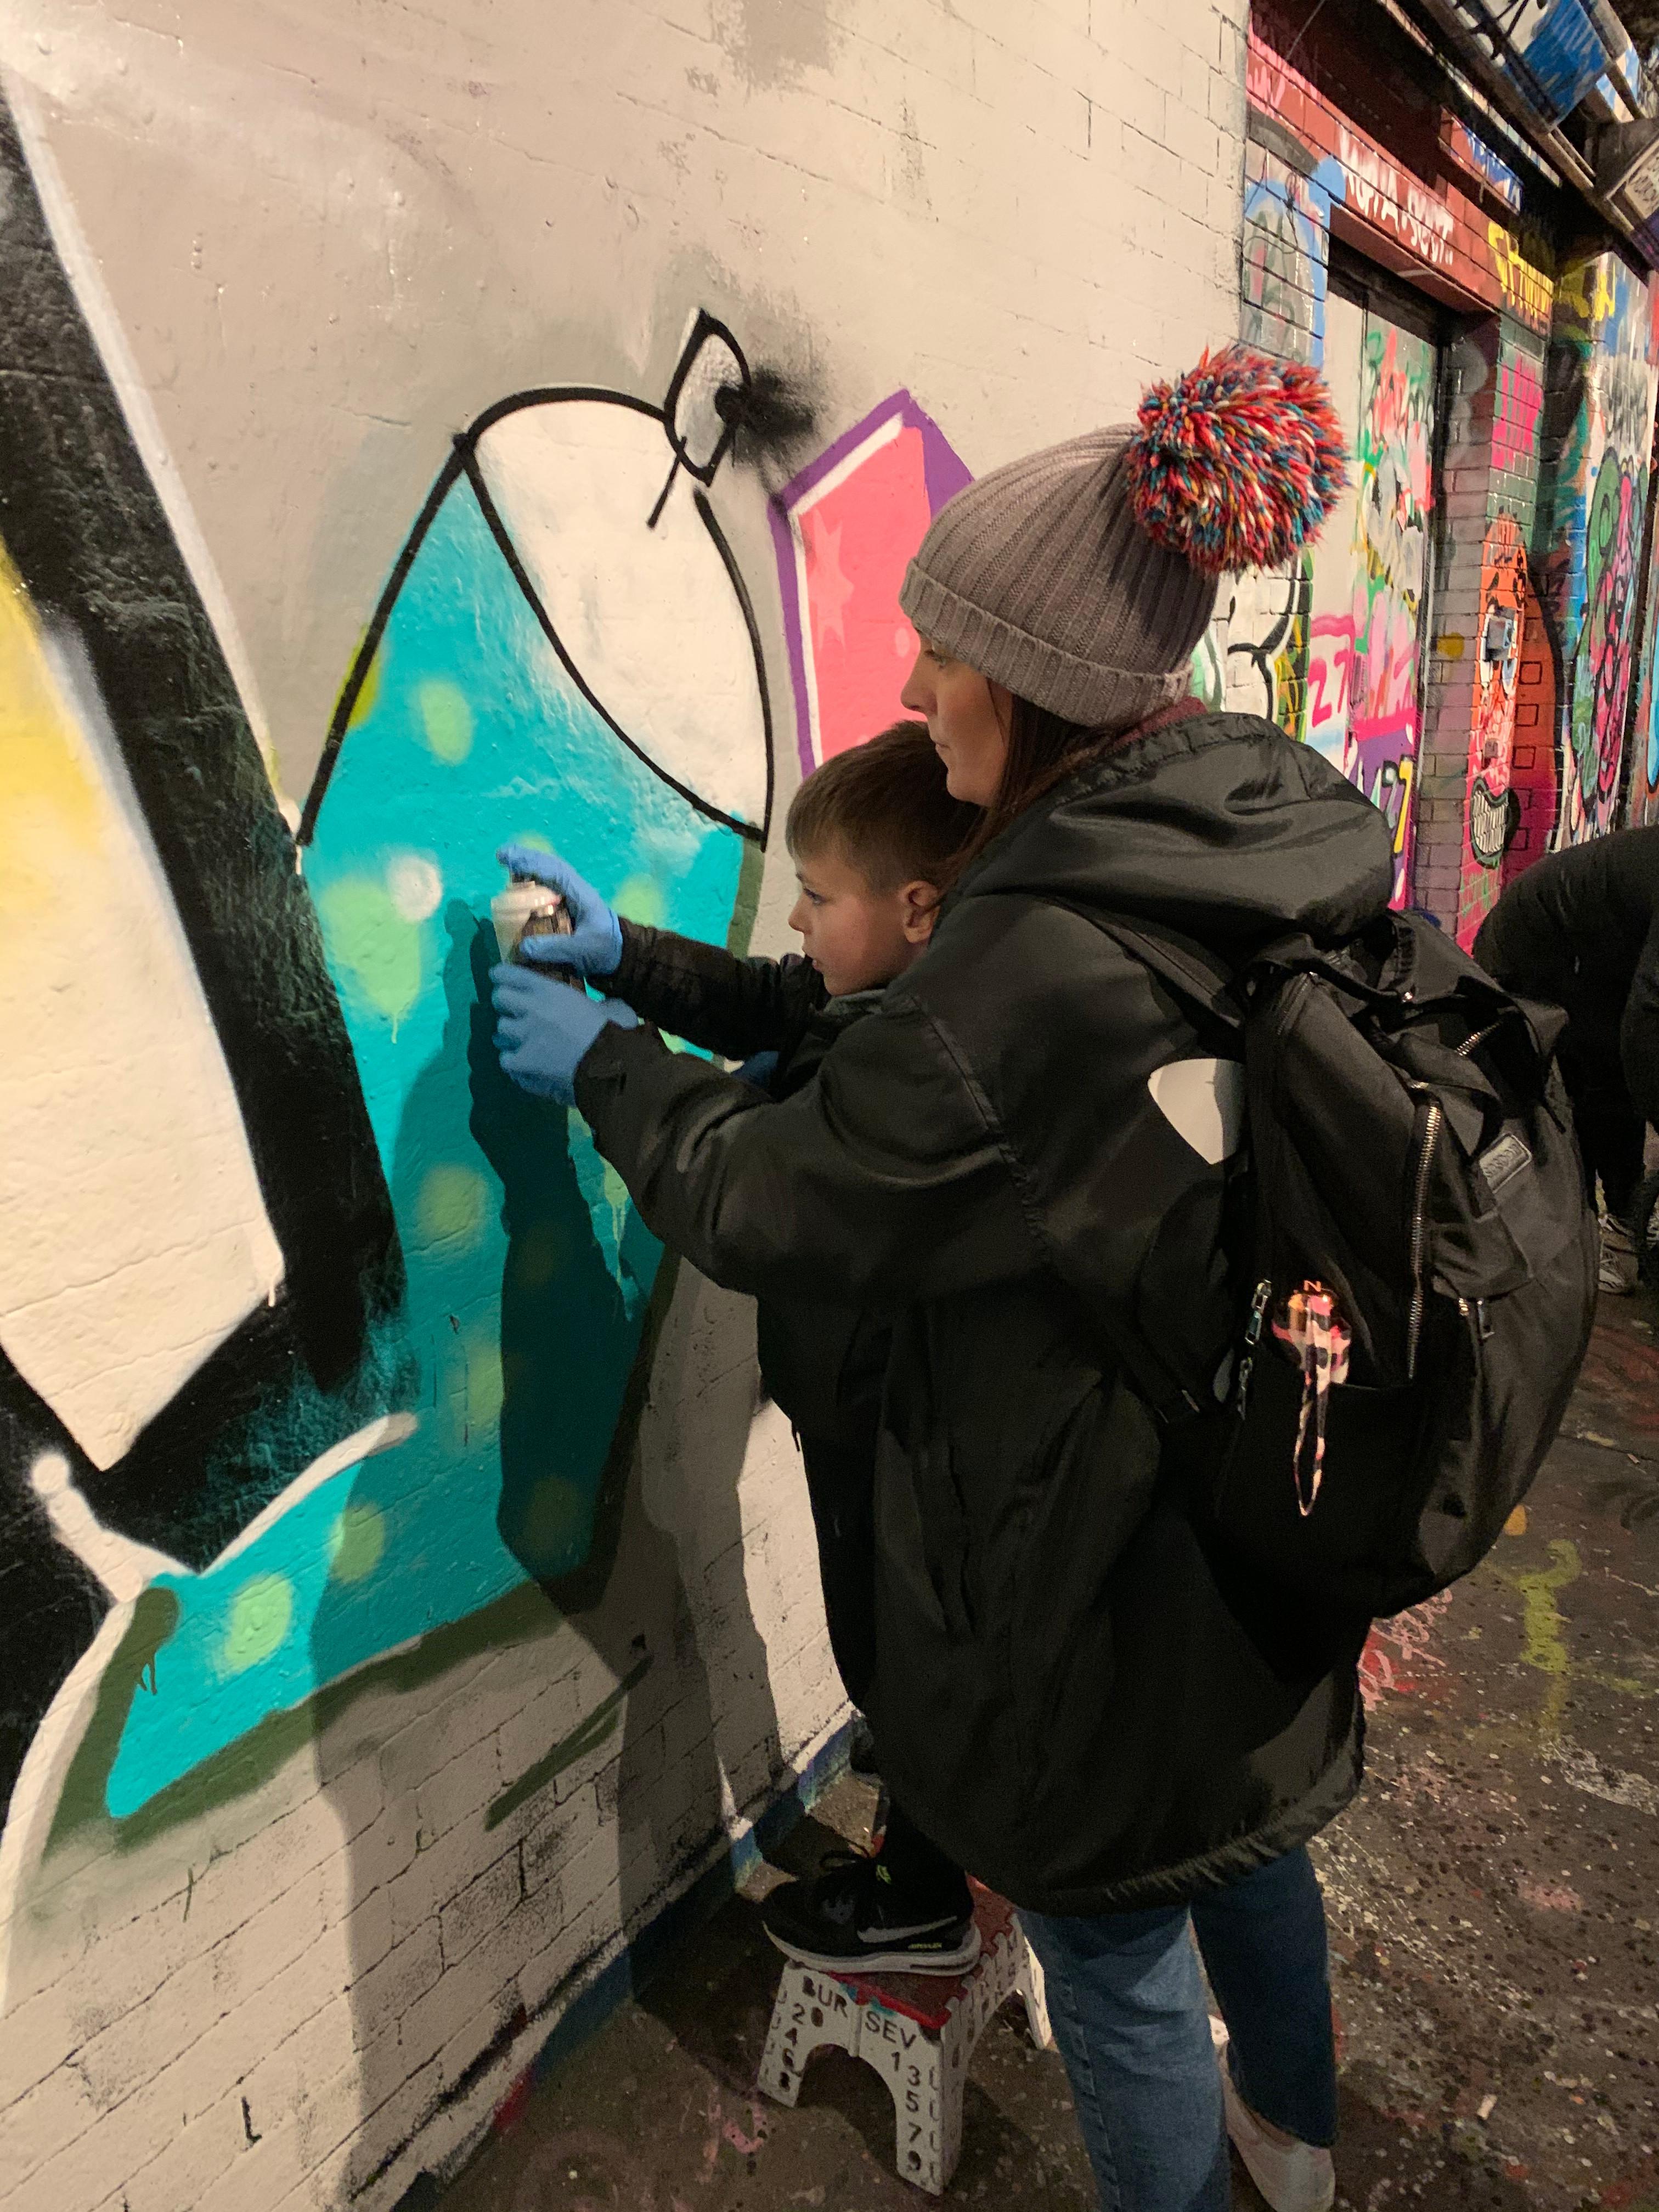 Graffiti workshop 2 adults + 2 children